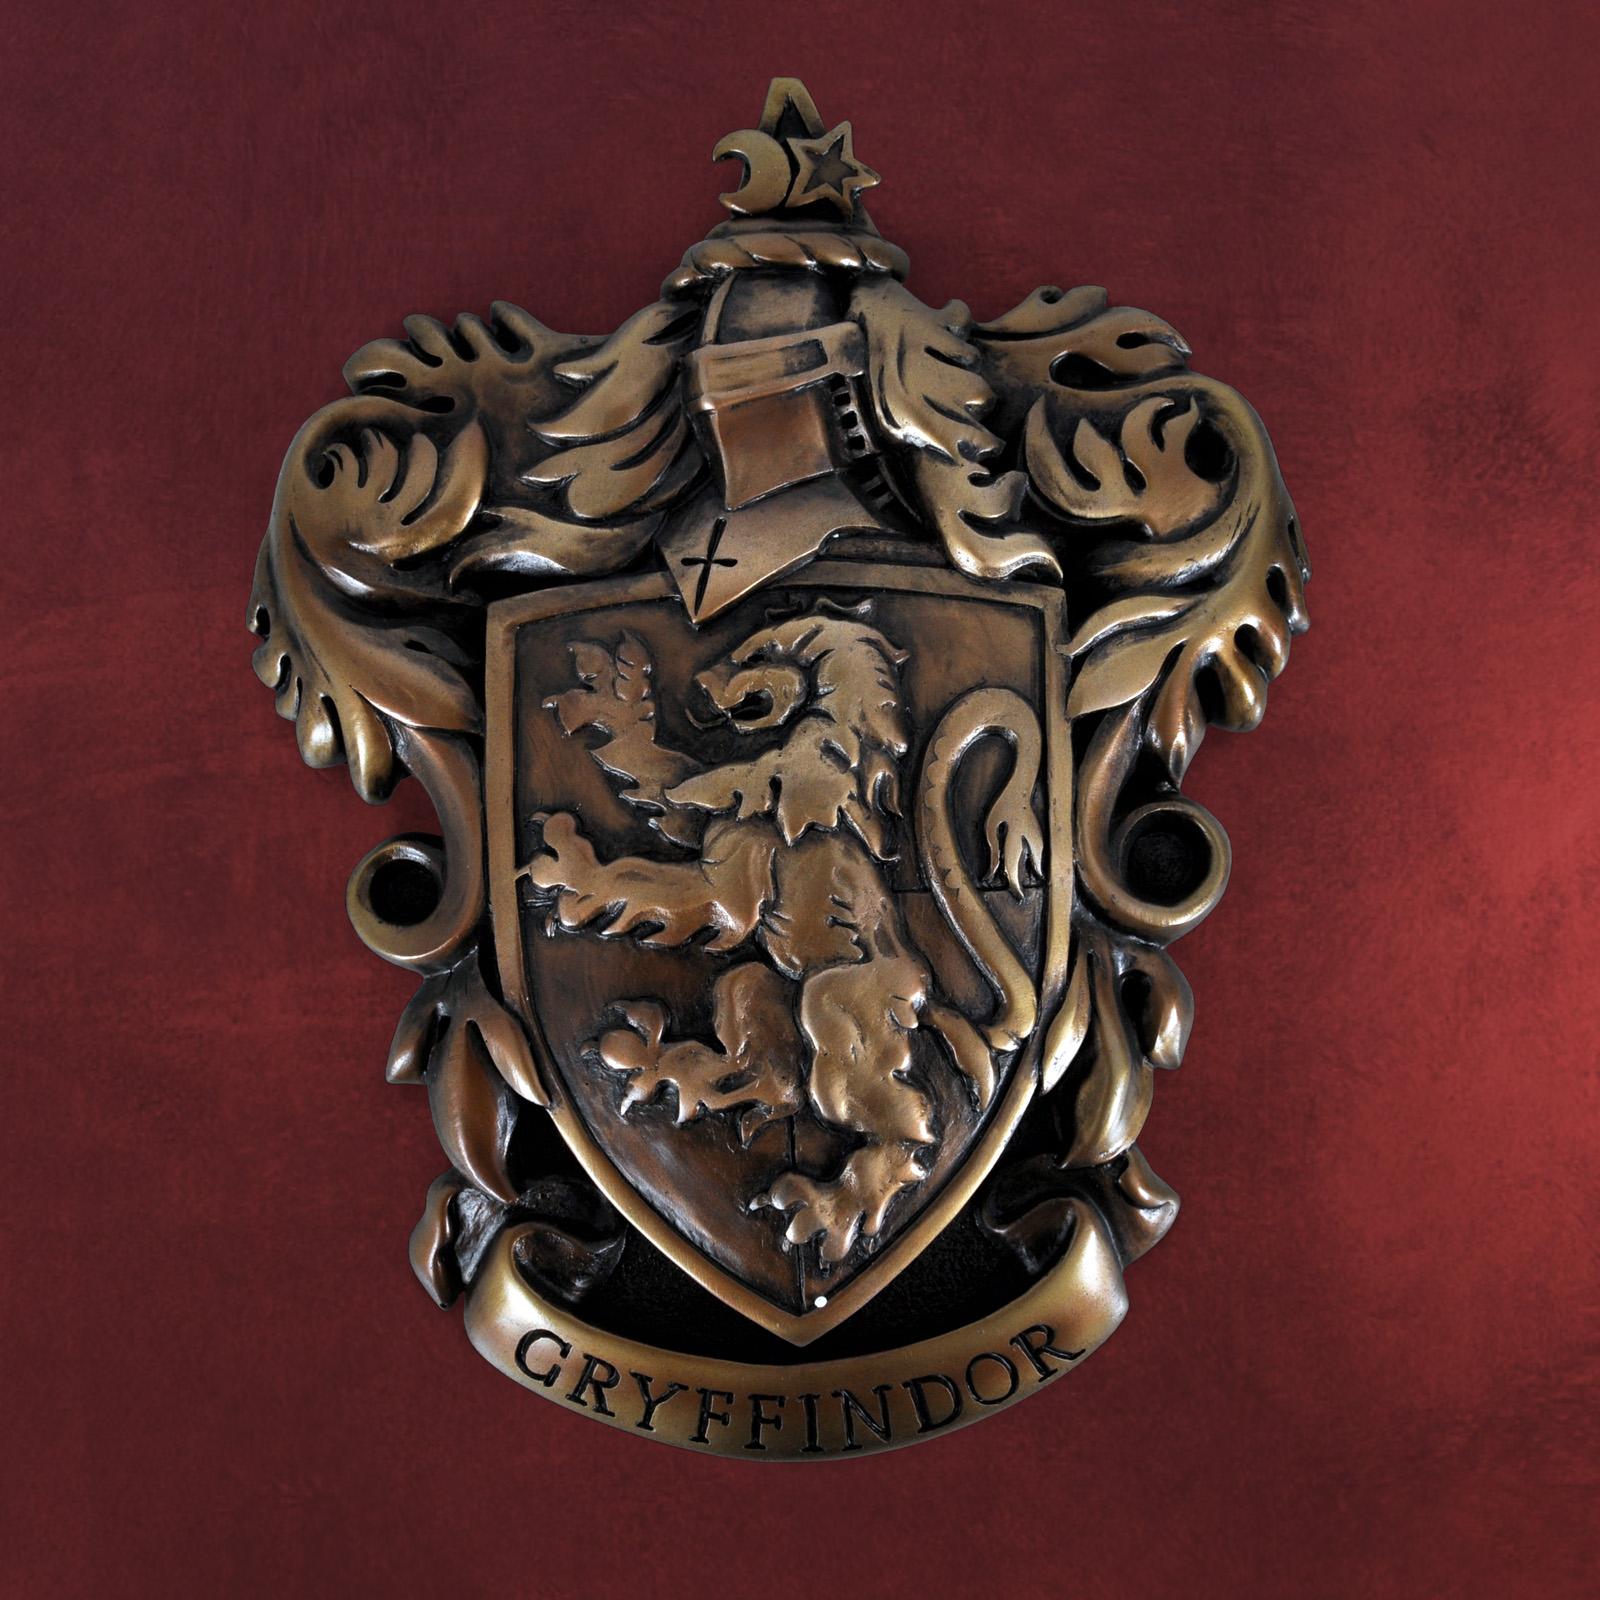 Harry Potter Gryffindor Wappen Elbenwald